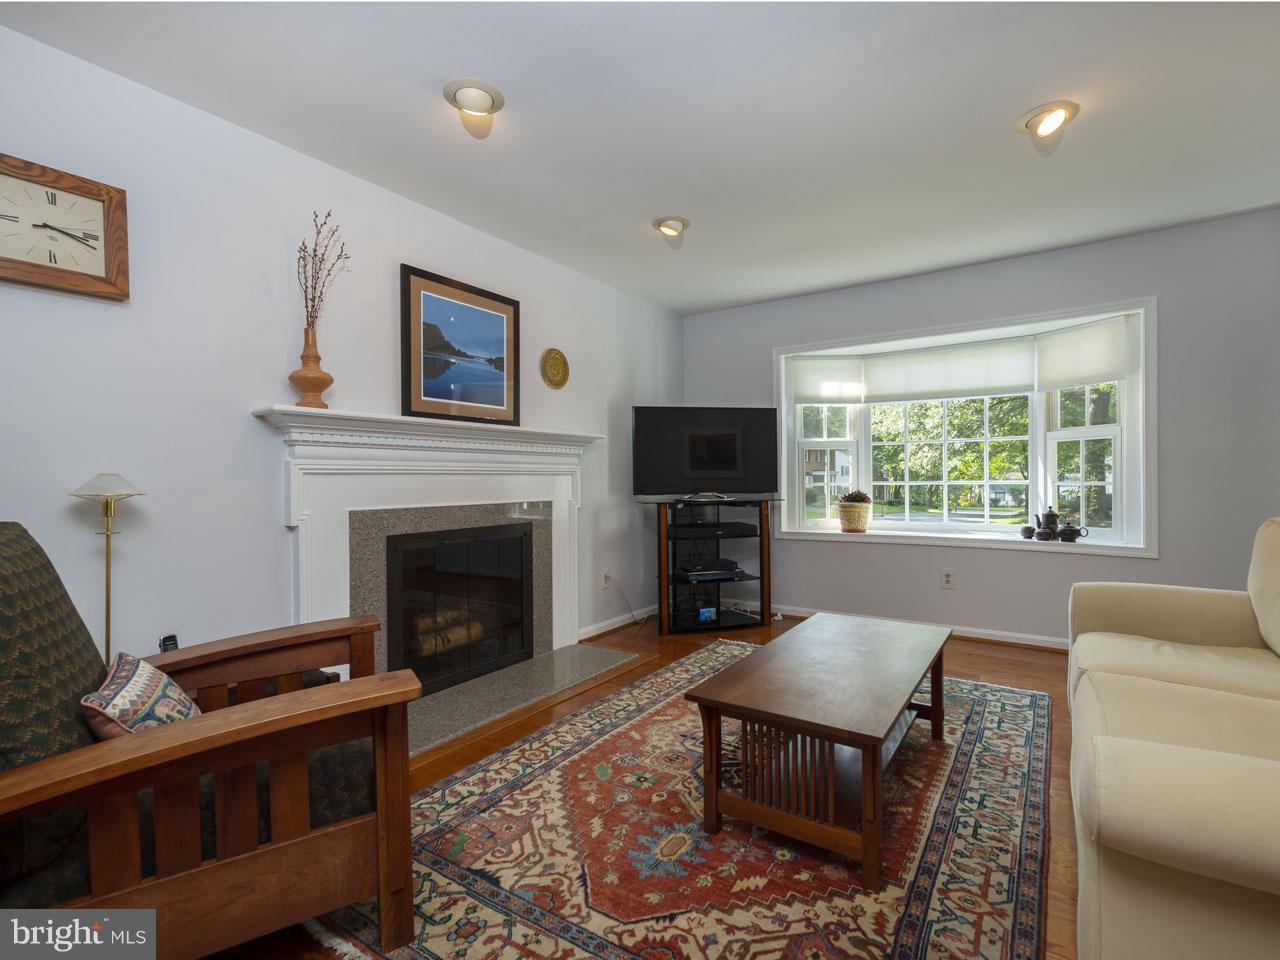 1006211278-300688039193-2021-07-22-07-39-40        Burke Delaware Real Estate For Sale   MLS# 1006211278  - Best of Northern Virginia